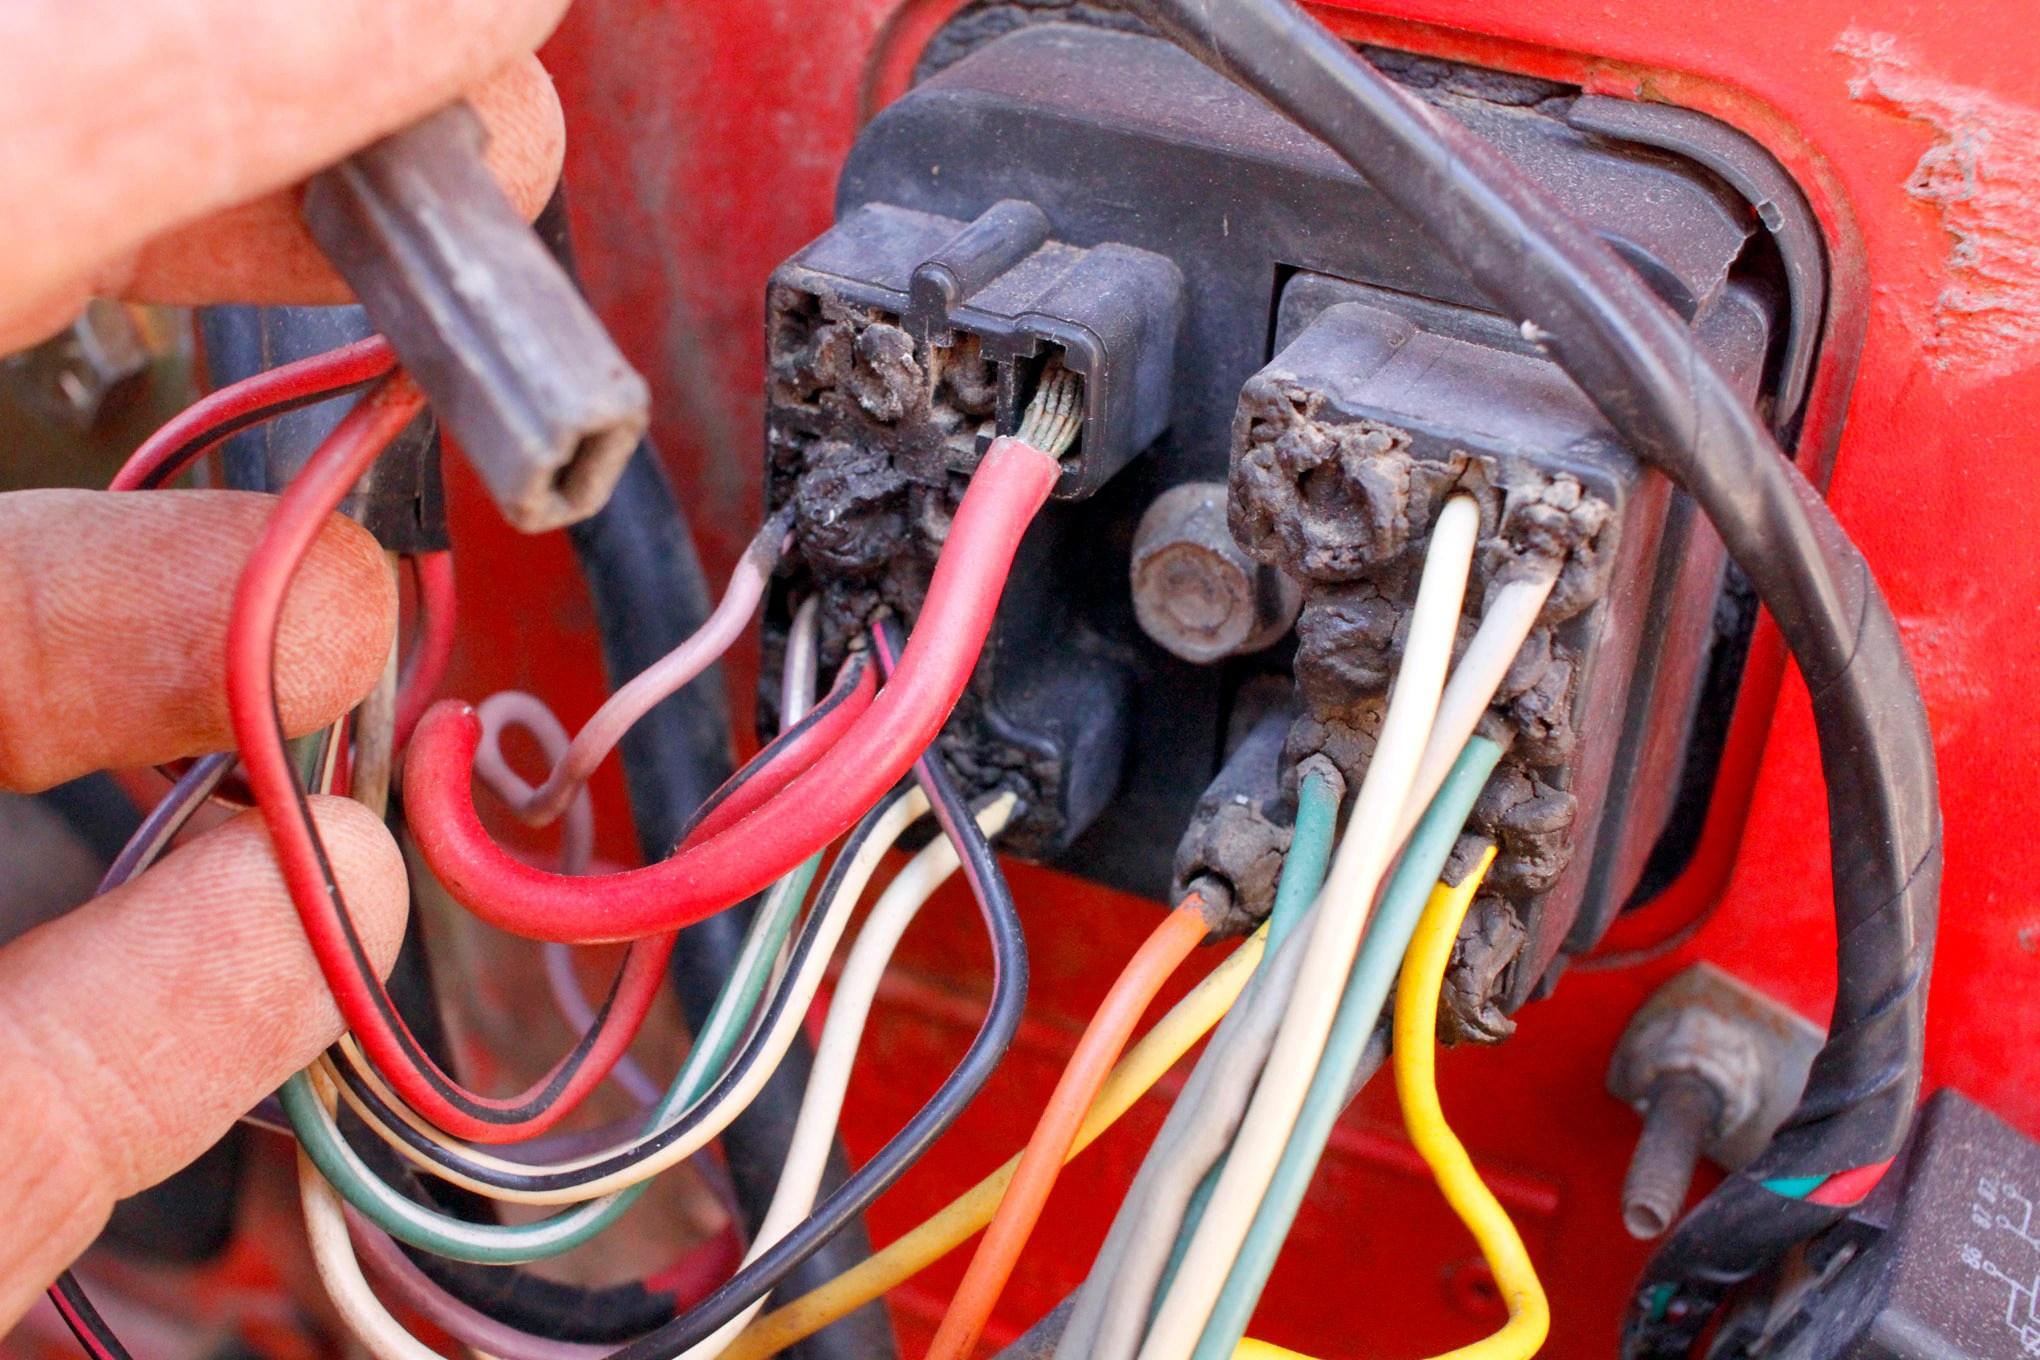 medium resolution of 003 1976 cj 5 painless wiring harness old bulkhead photo 03